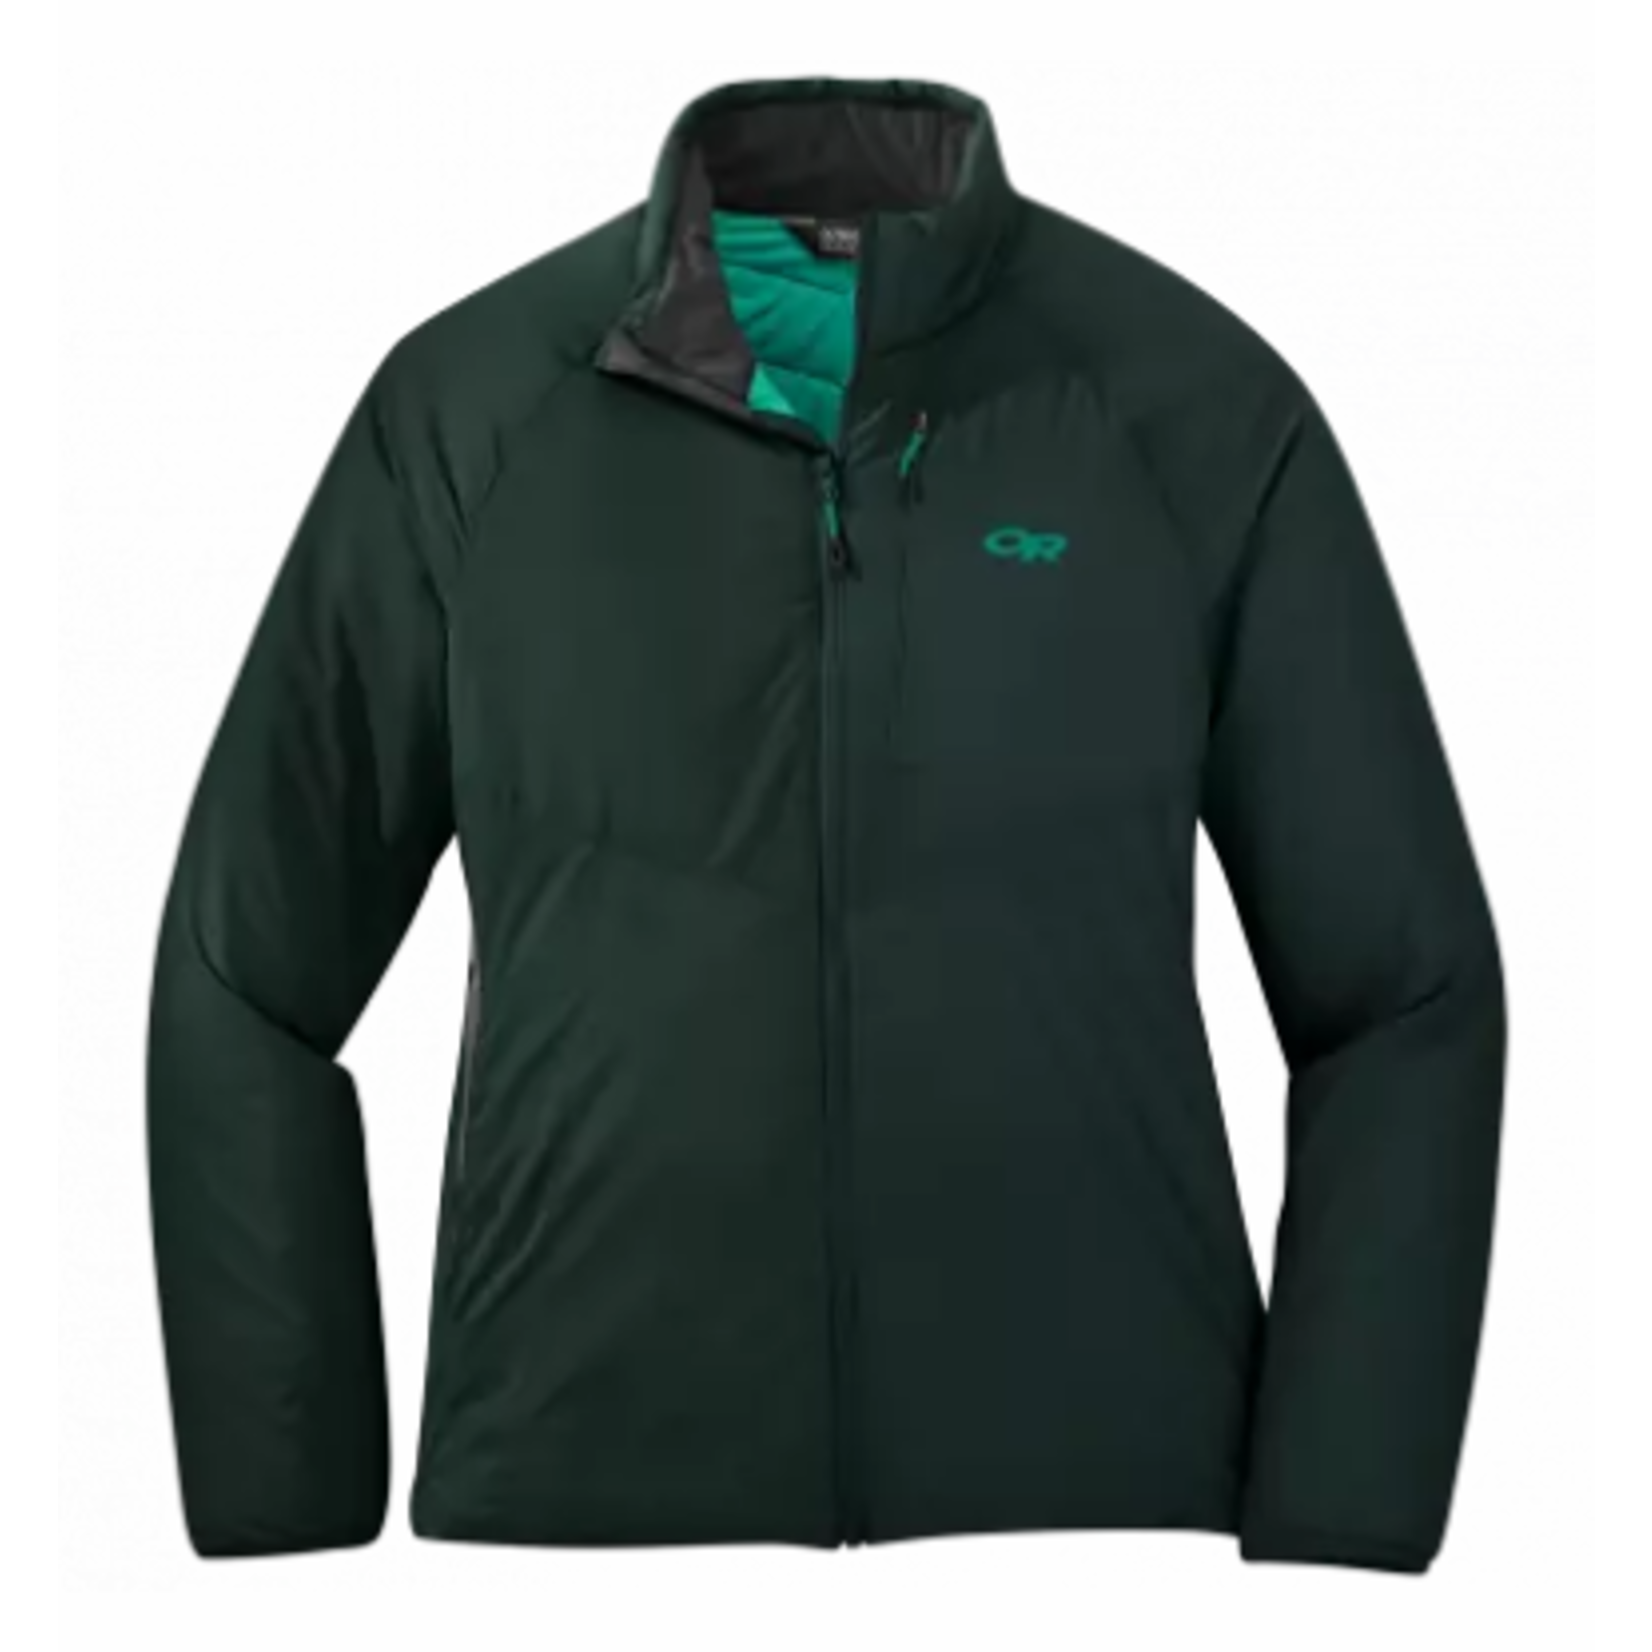 OR Outdoor Research Women Refuge Jacket